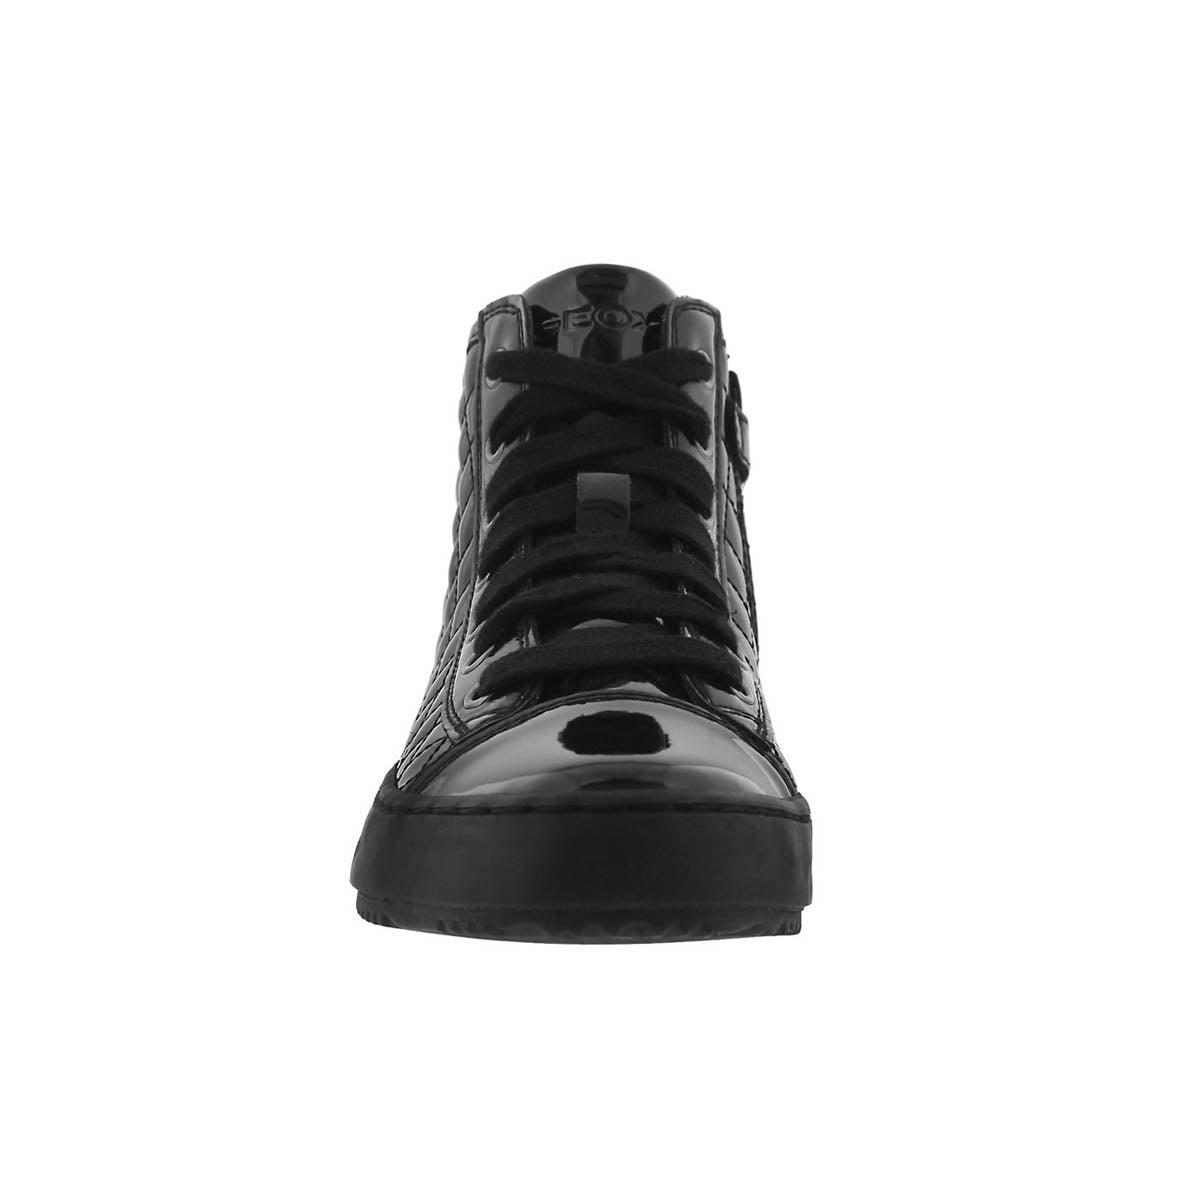 Grls Kalispera black high top sneaker